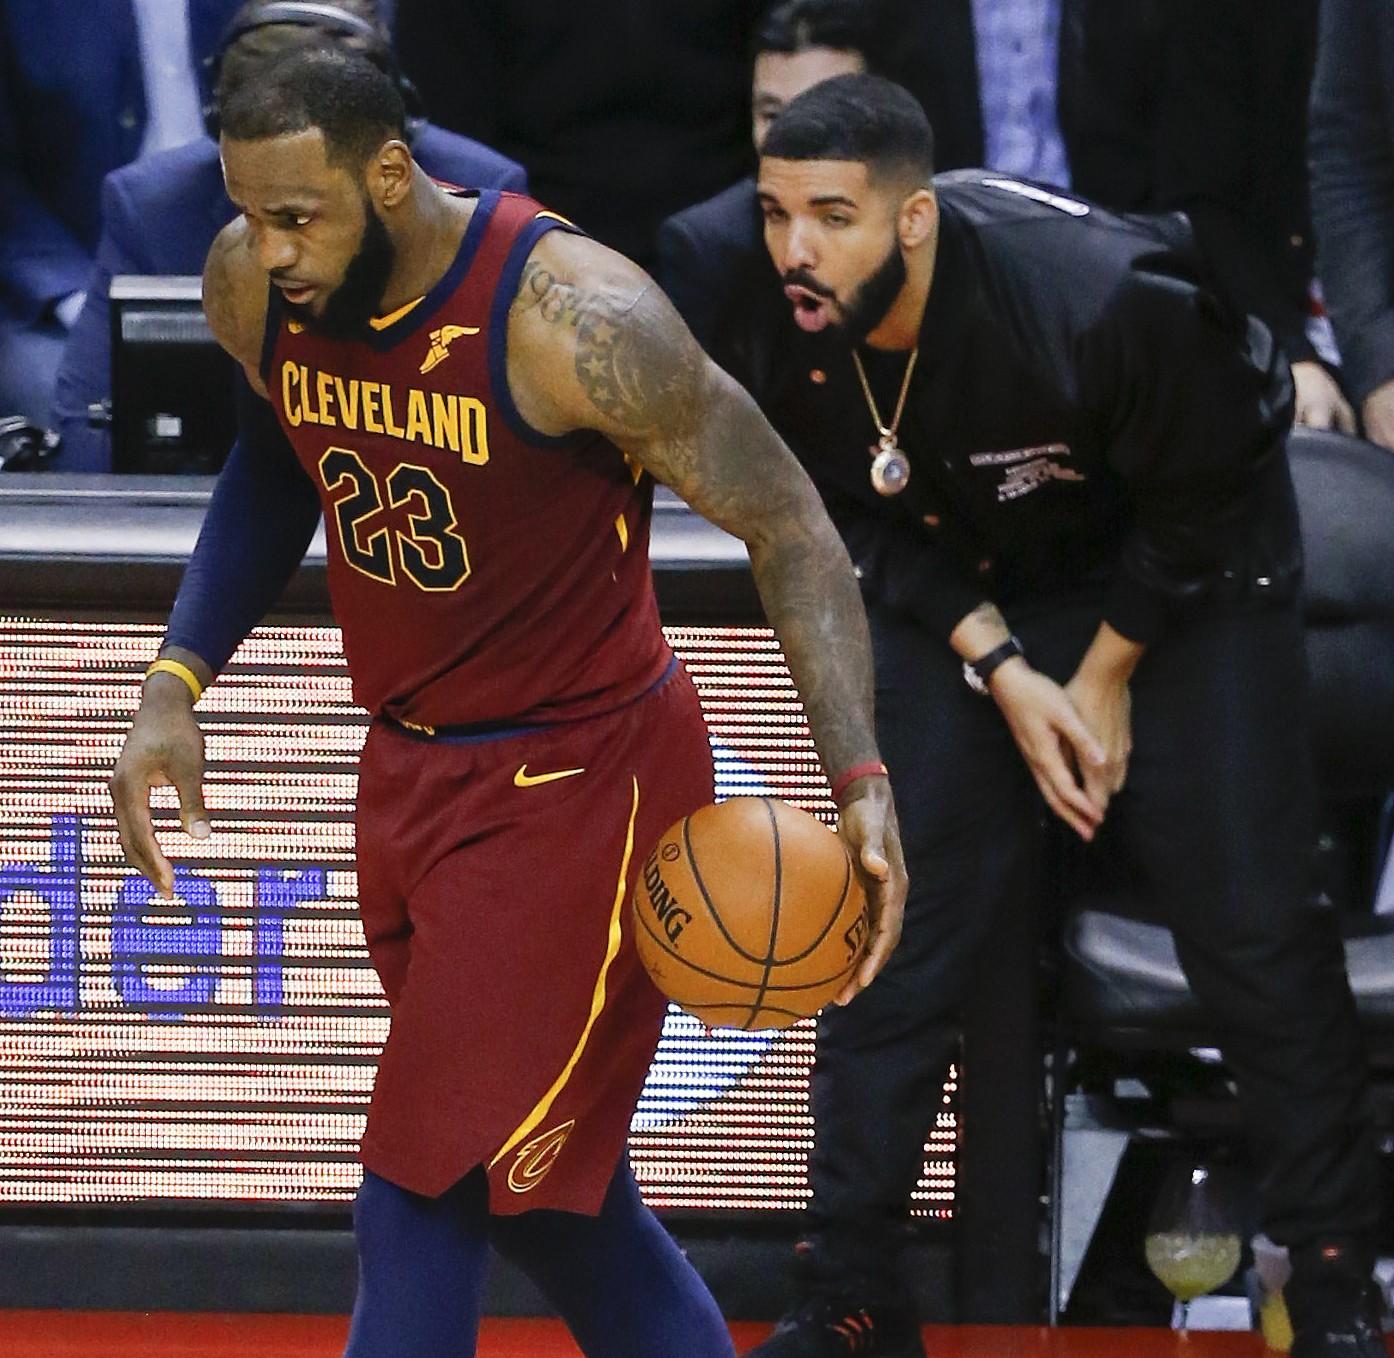 Nba Tells Drake To Cool It After Kendrick Perkins Argument